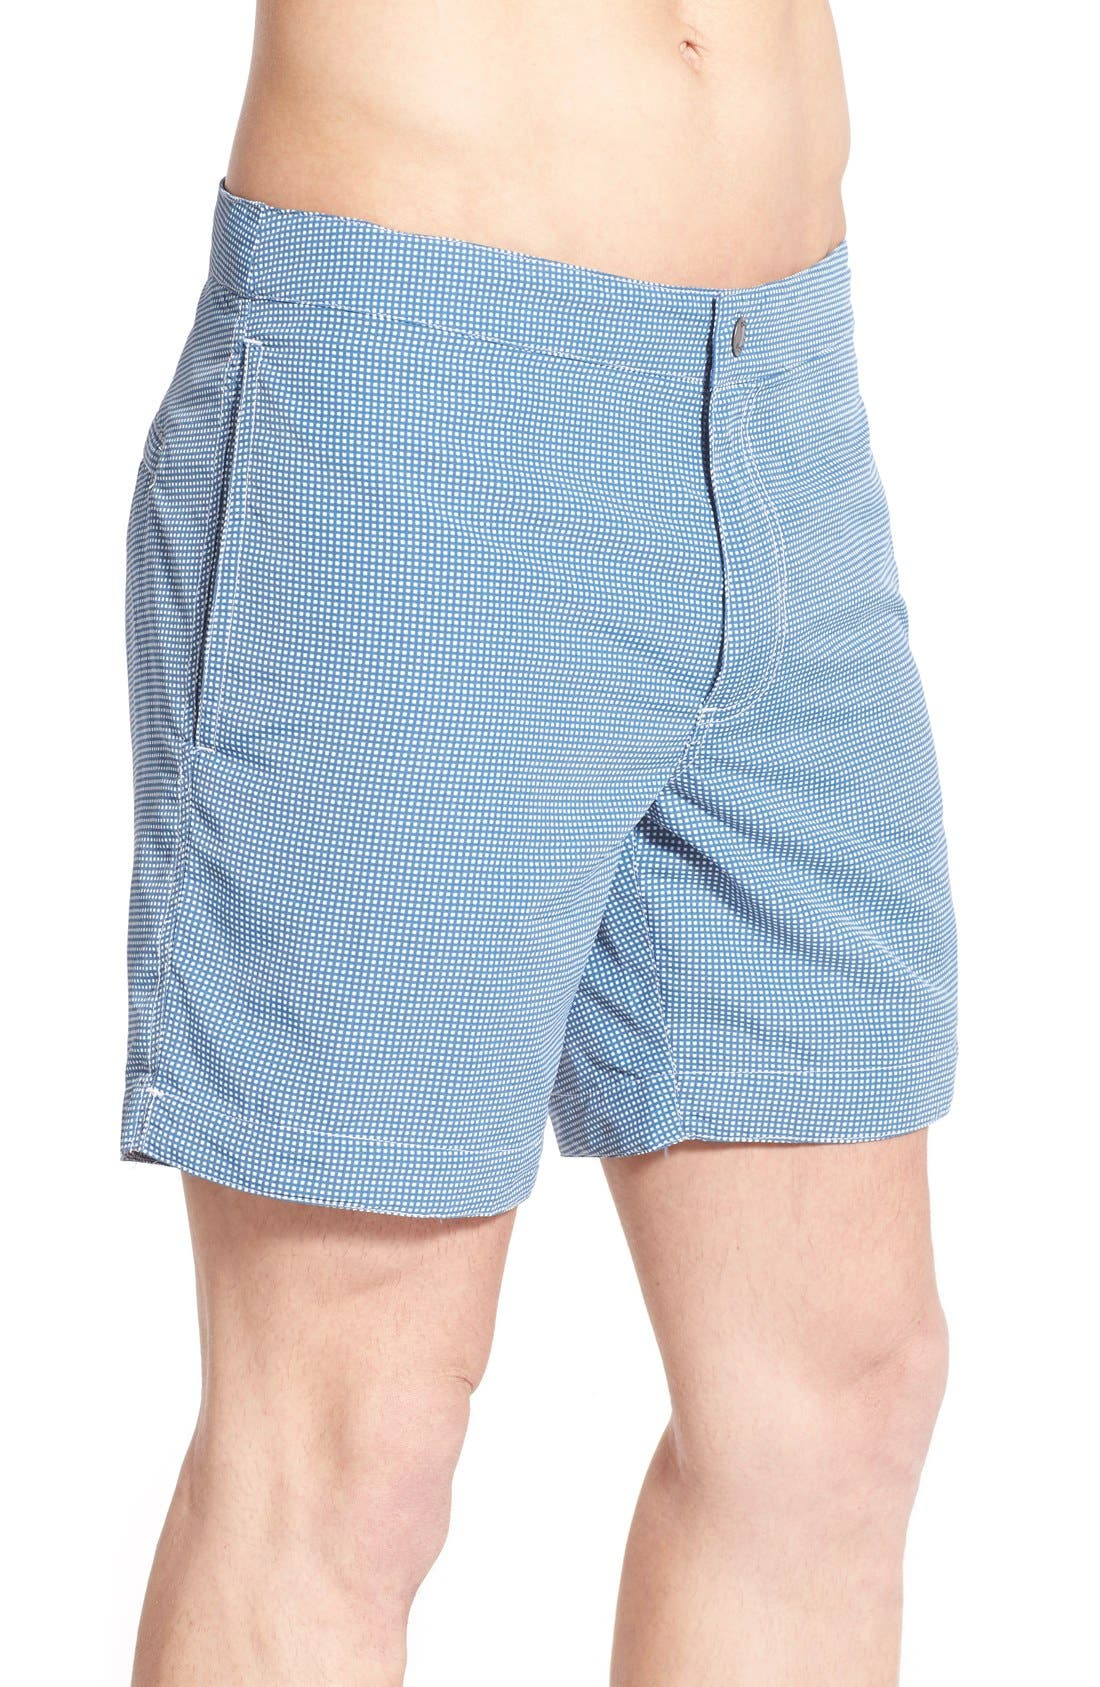 Aruba Tailored Fit Microcheck Swim Trunks,                             Alternate thumbnail 3, color,                             Micro Square Ash Blue